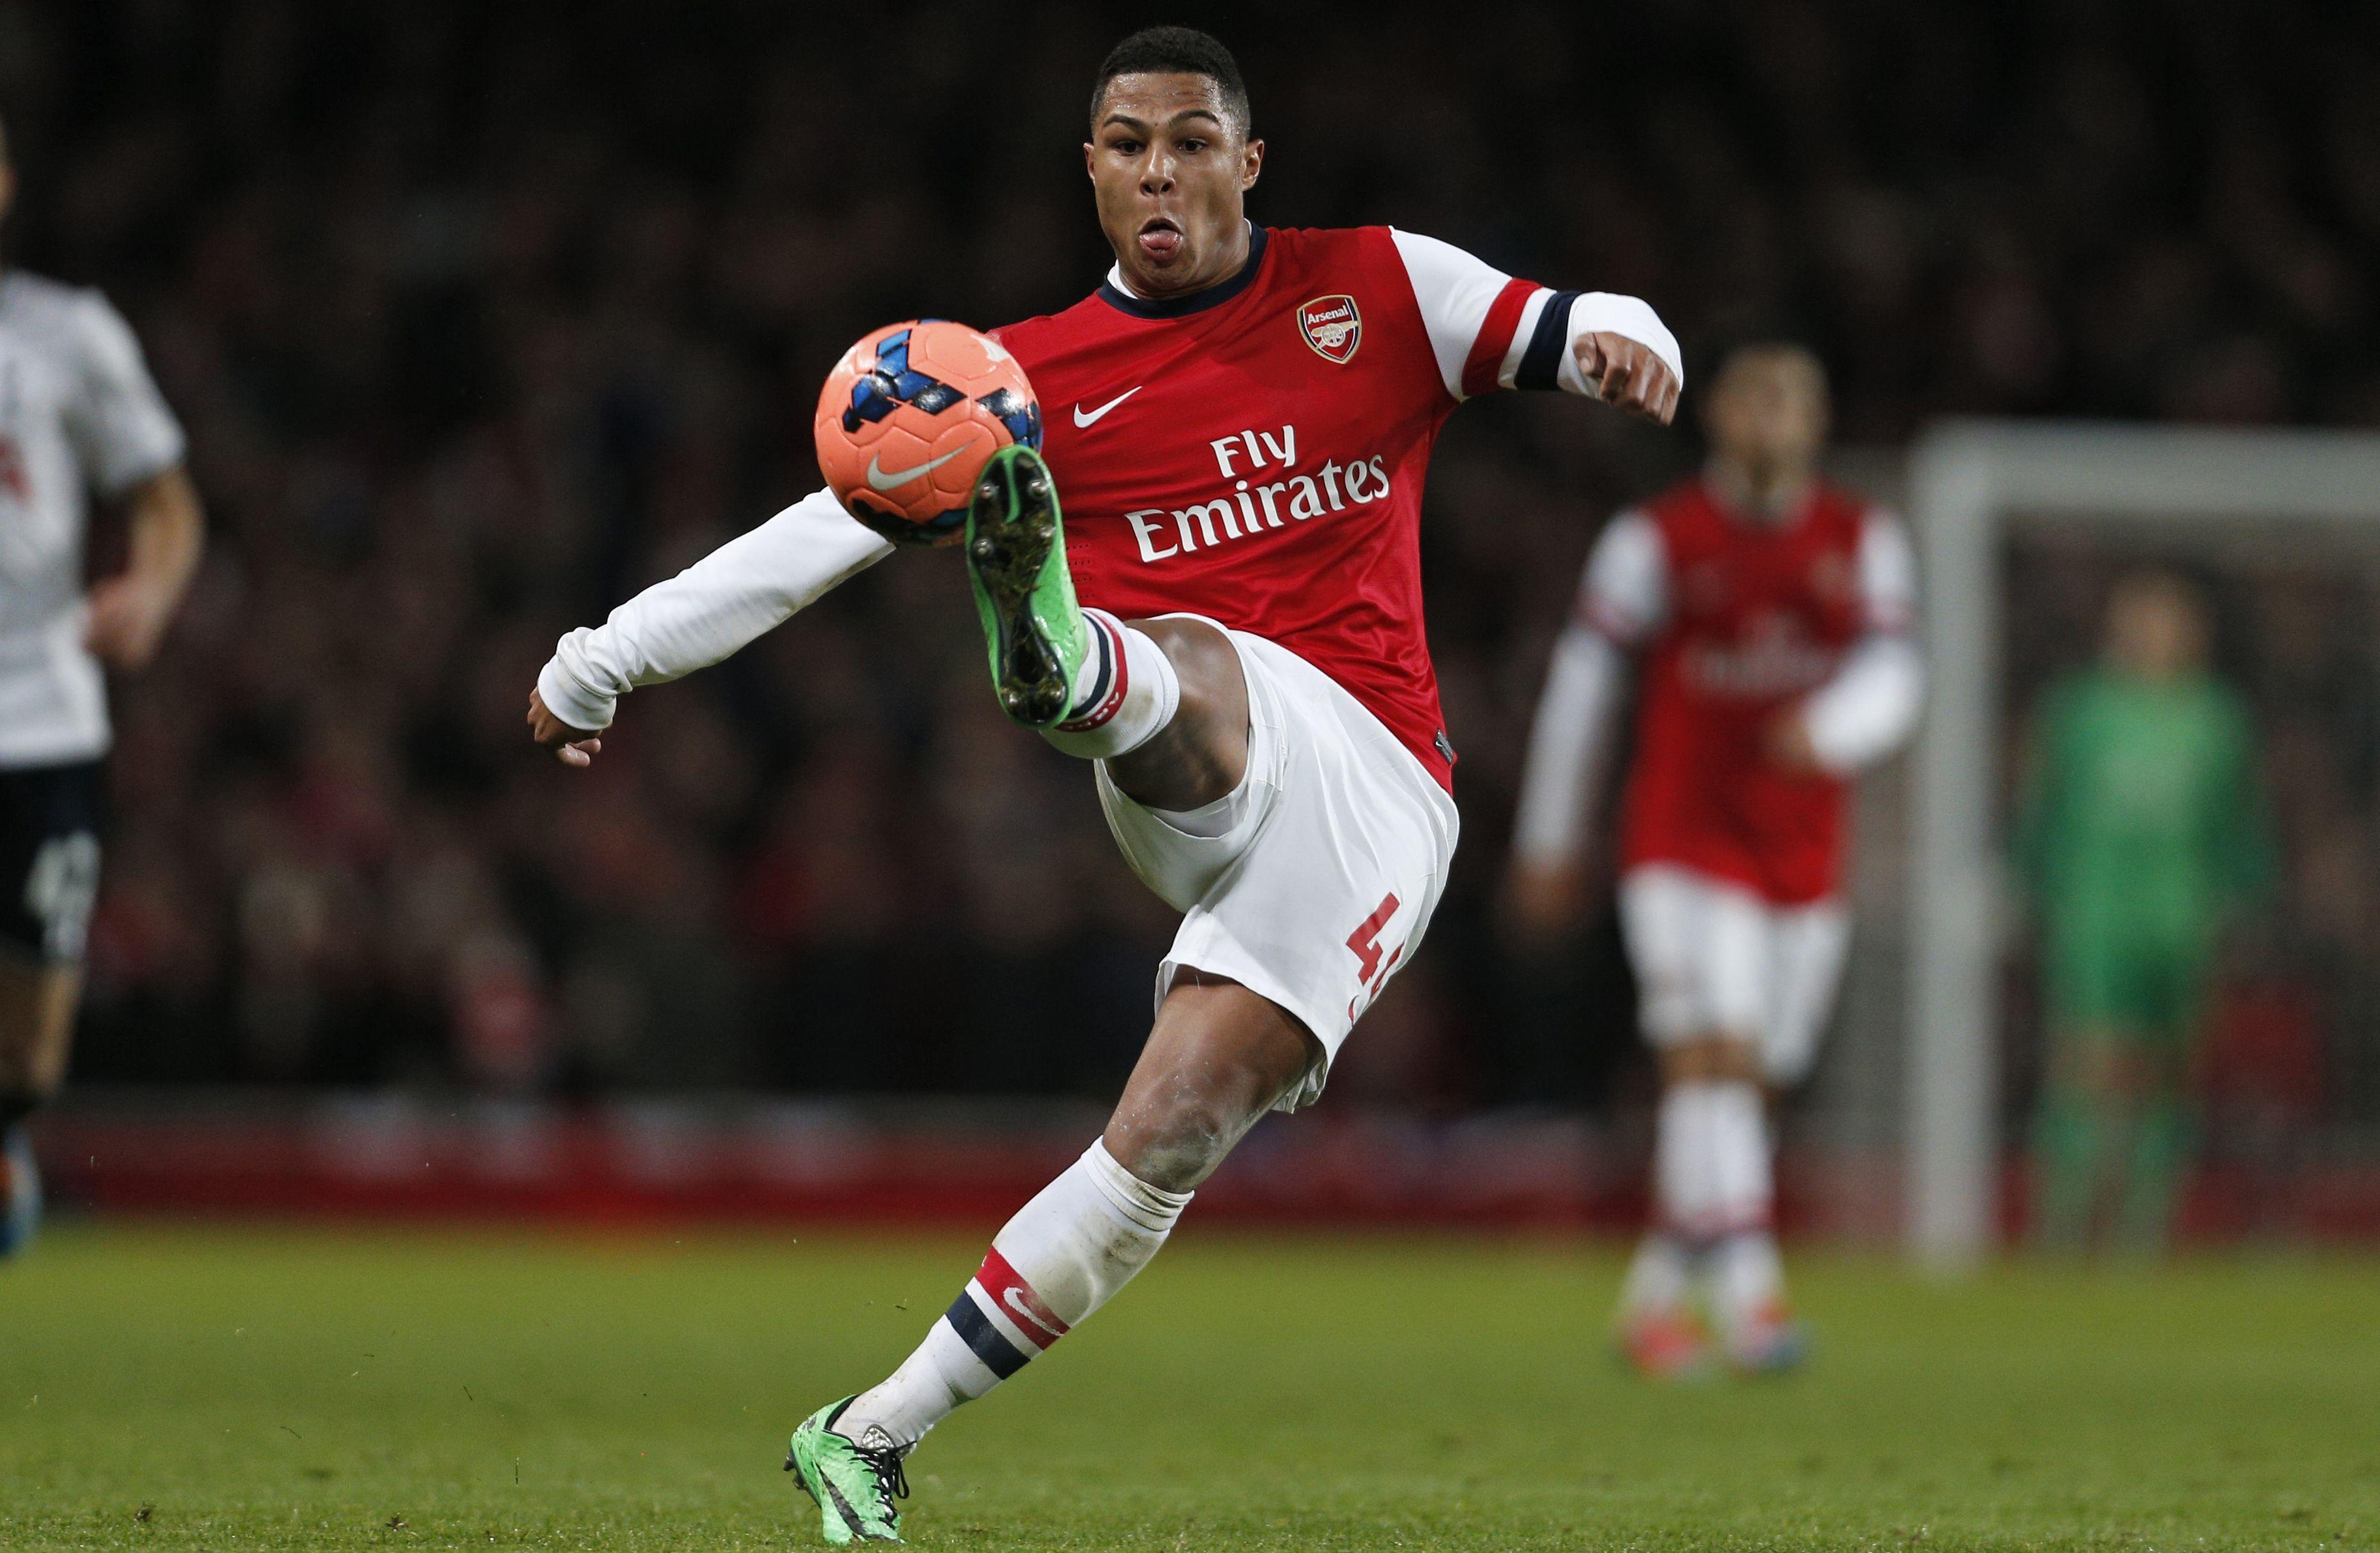 Arsenal winger Serge Gnabry